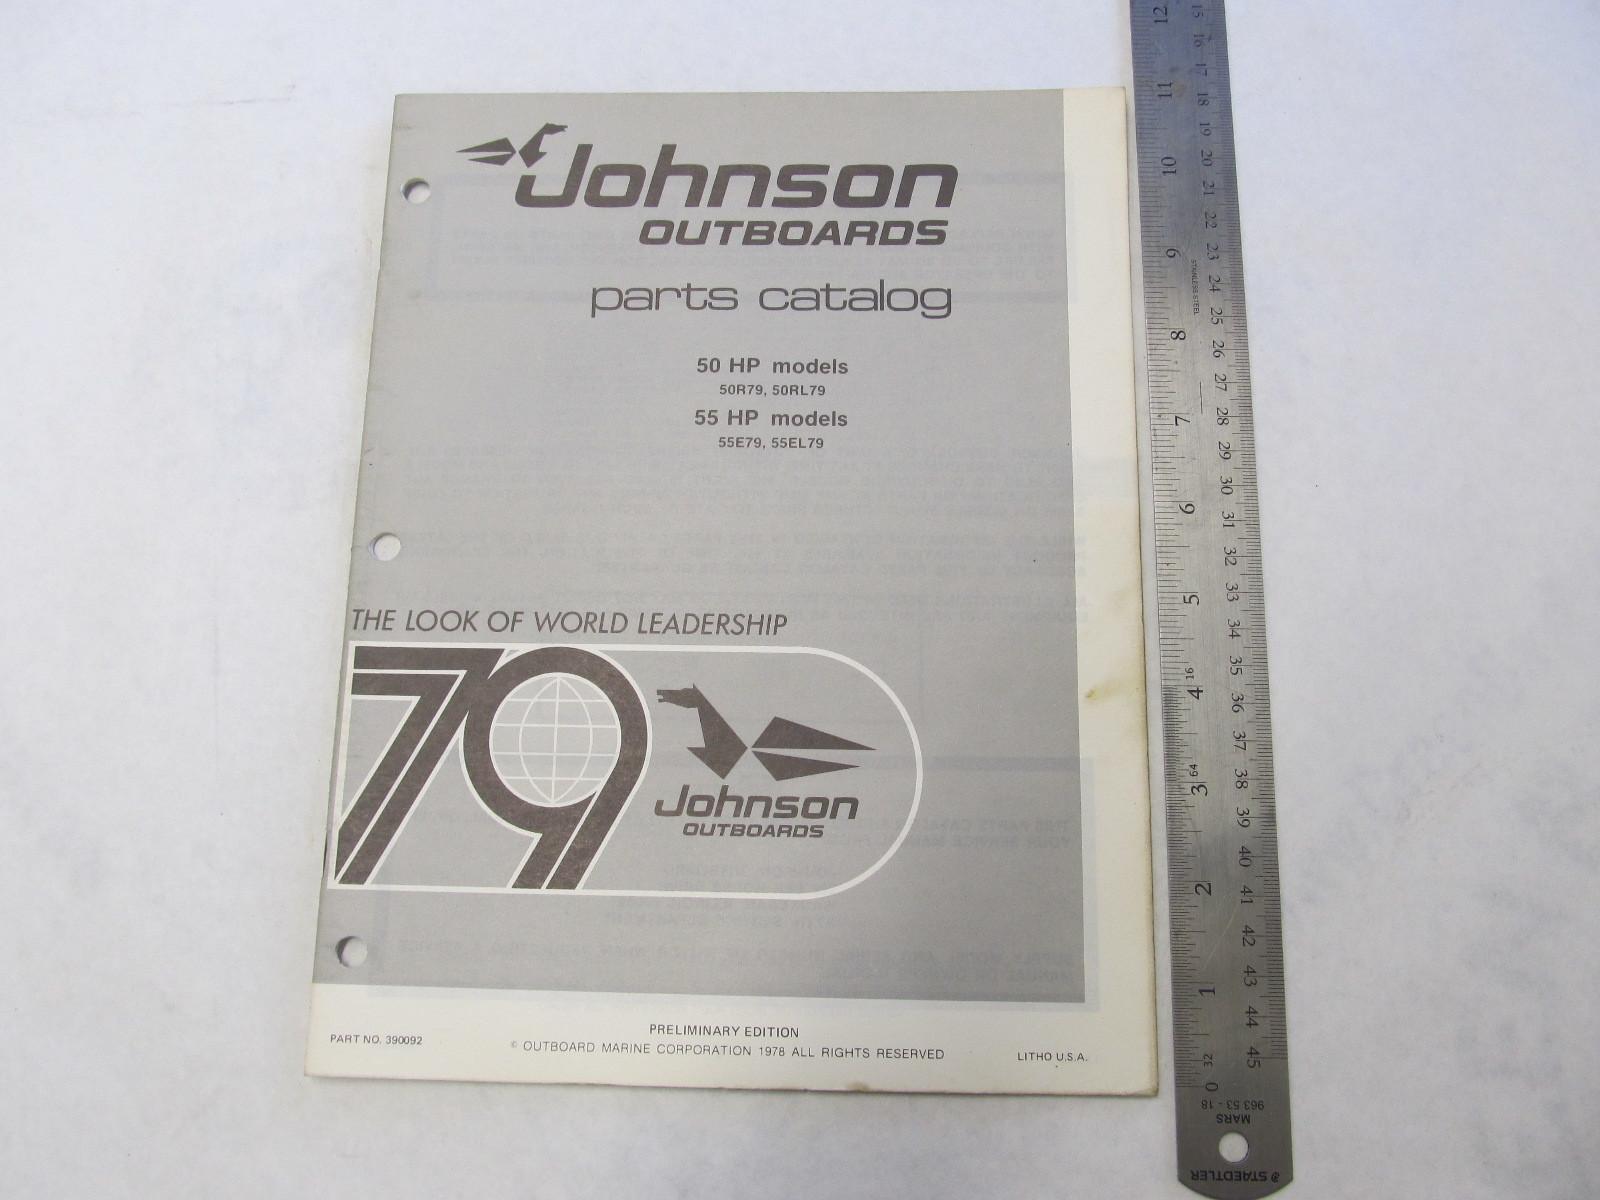 1979 Johnson Outboard Parts Catalog 50-55 HP